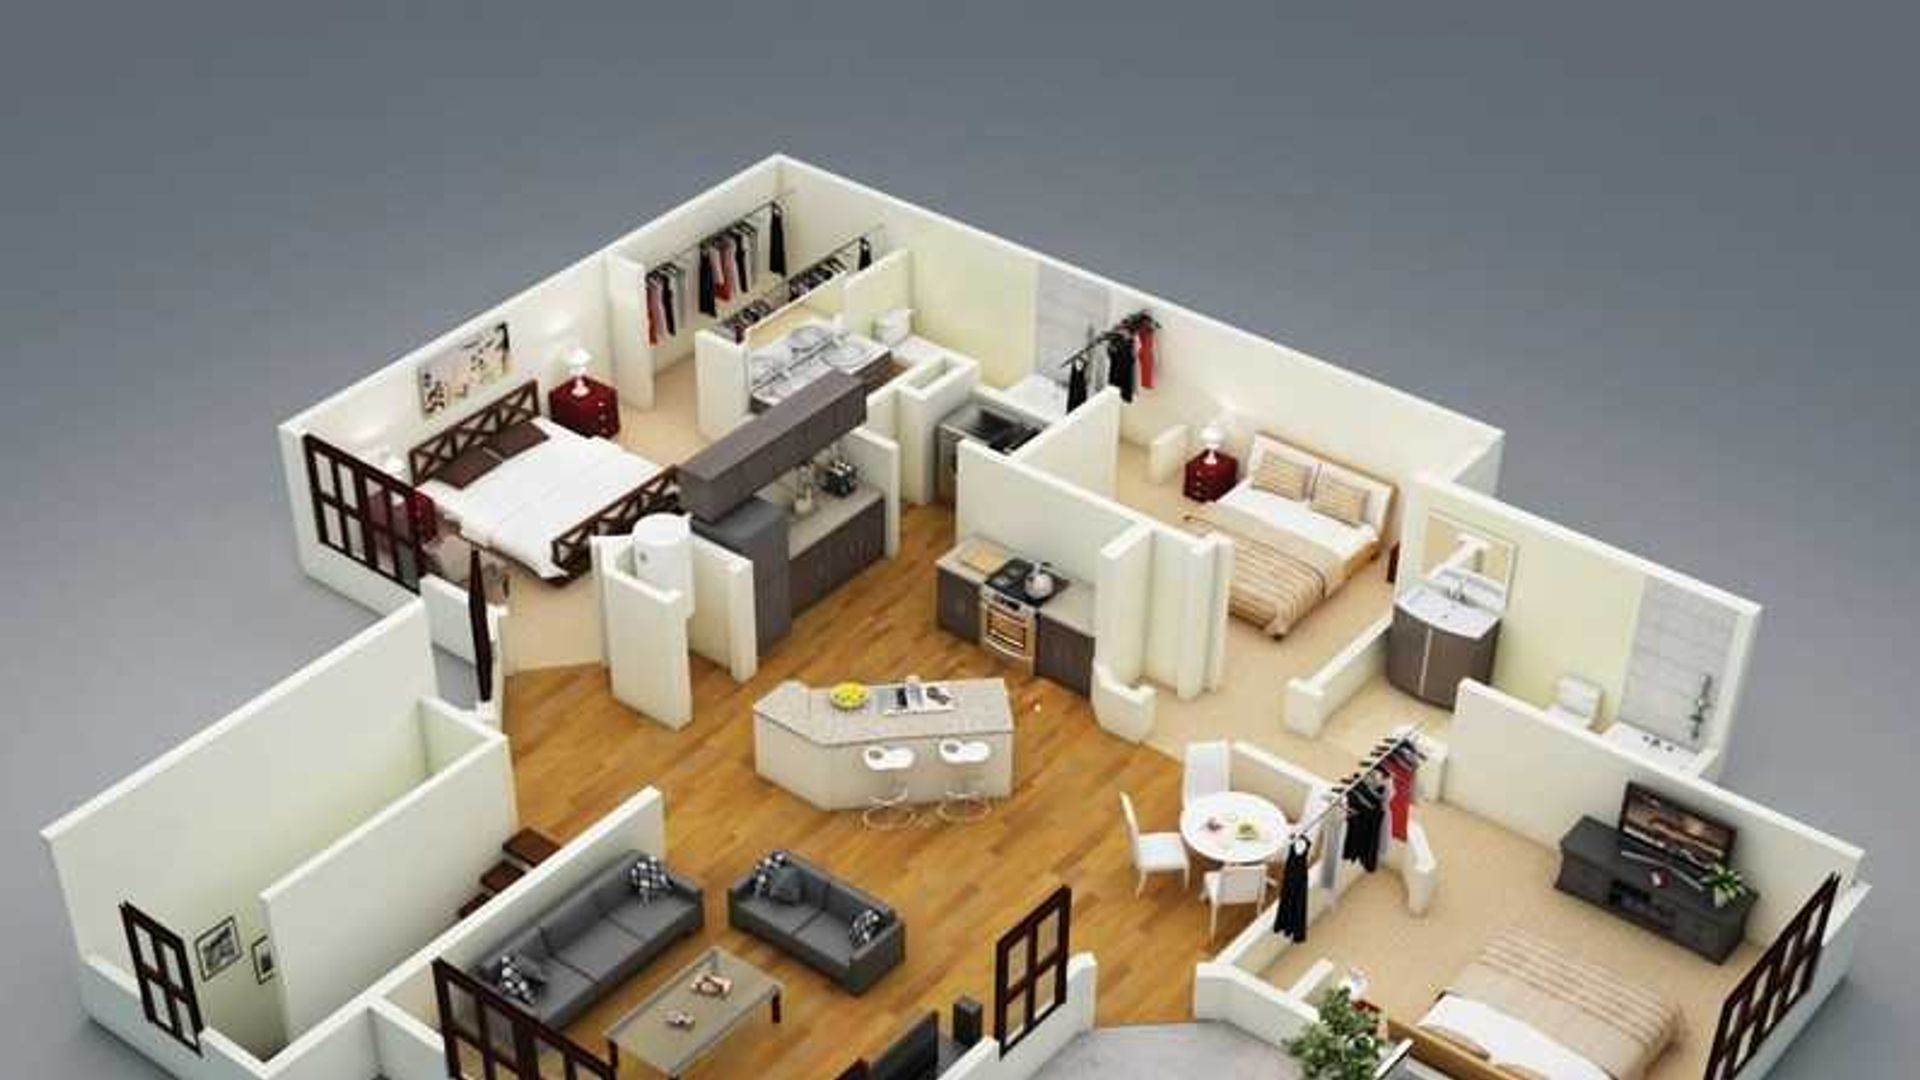 1 bed apartment at Lake Nona Central, Orlando, FL ...